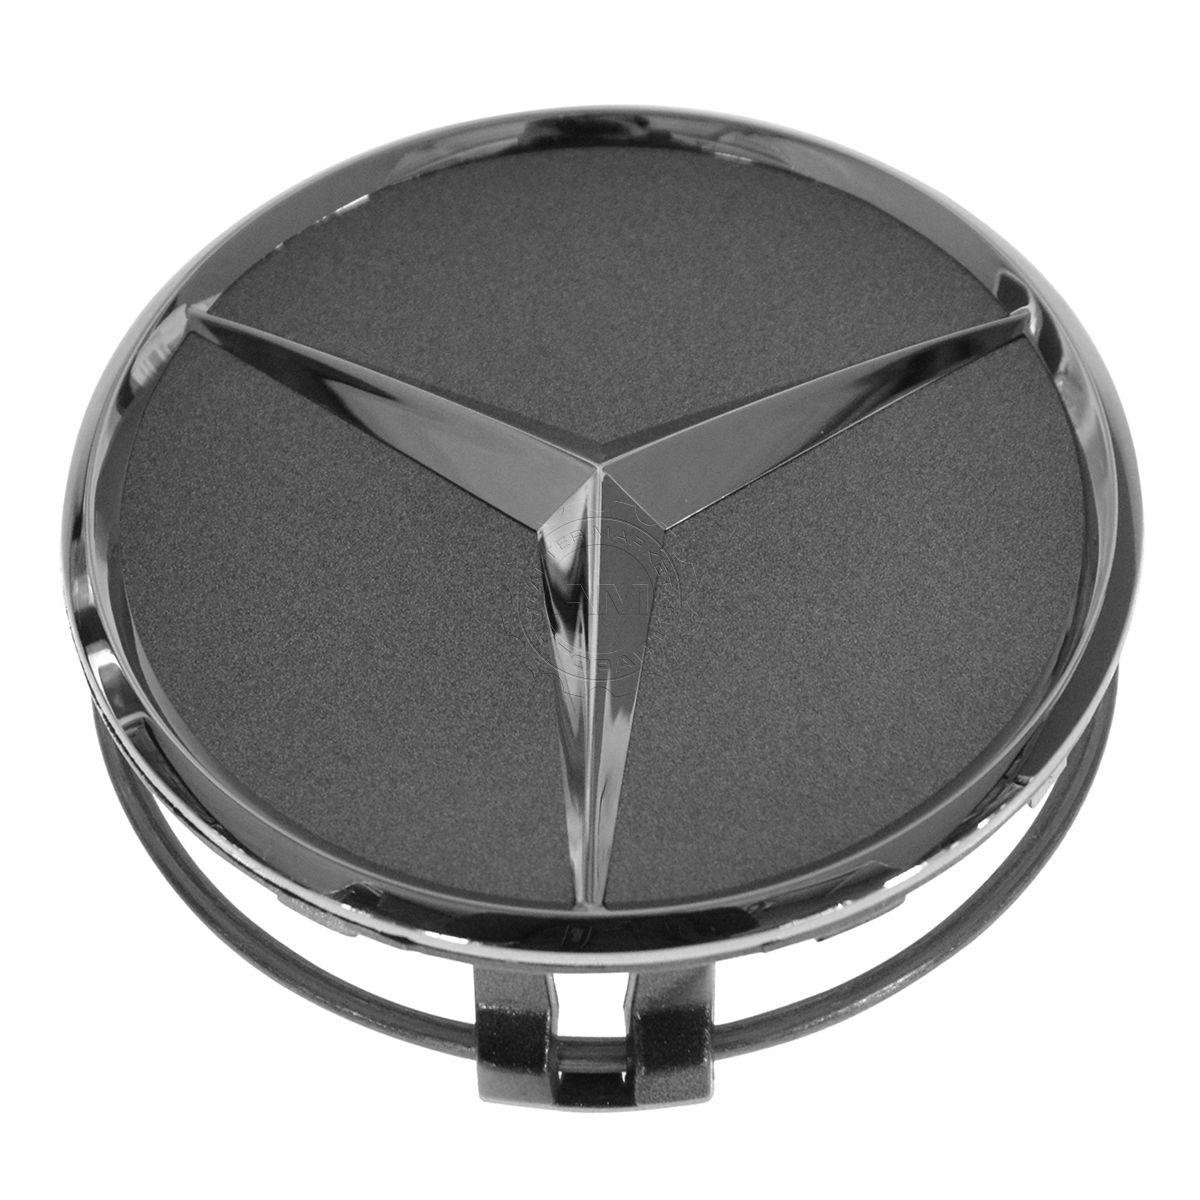 OEM 22040001257756 Wheel Cap Gray /& Chrome Center Set of 4 for Mercedes Benz